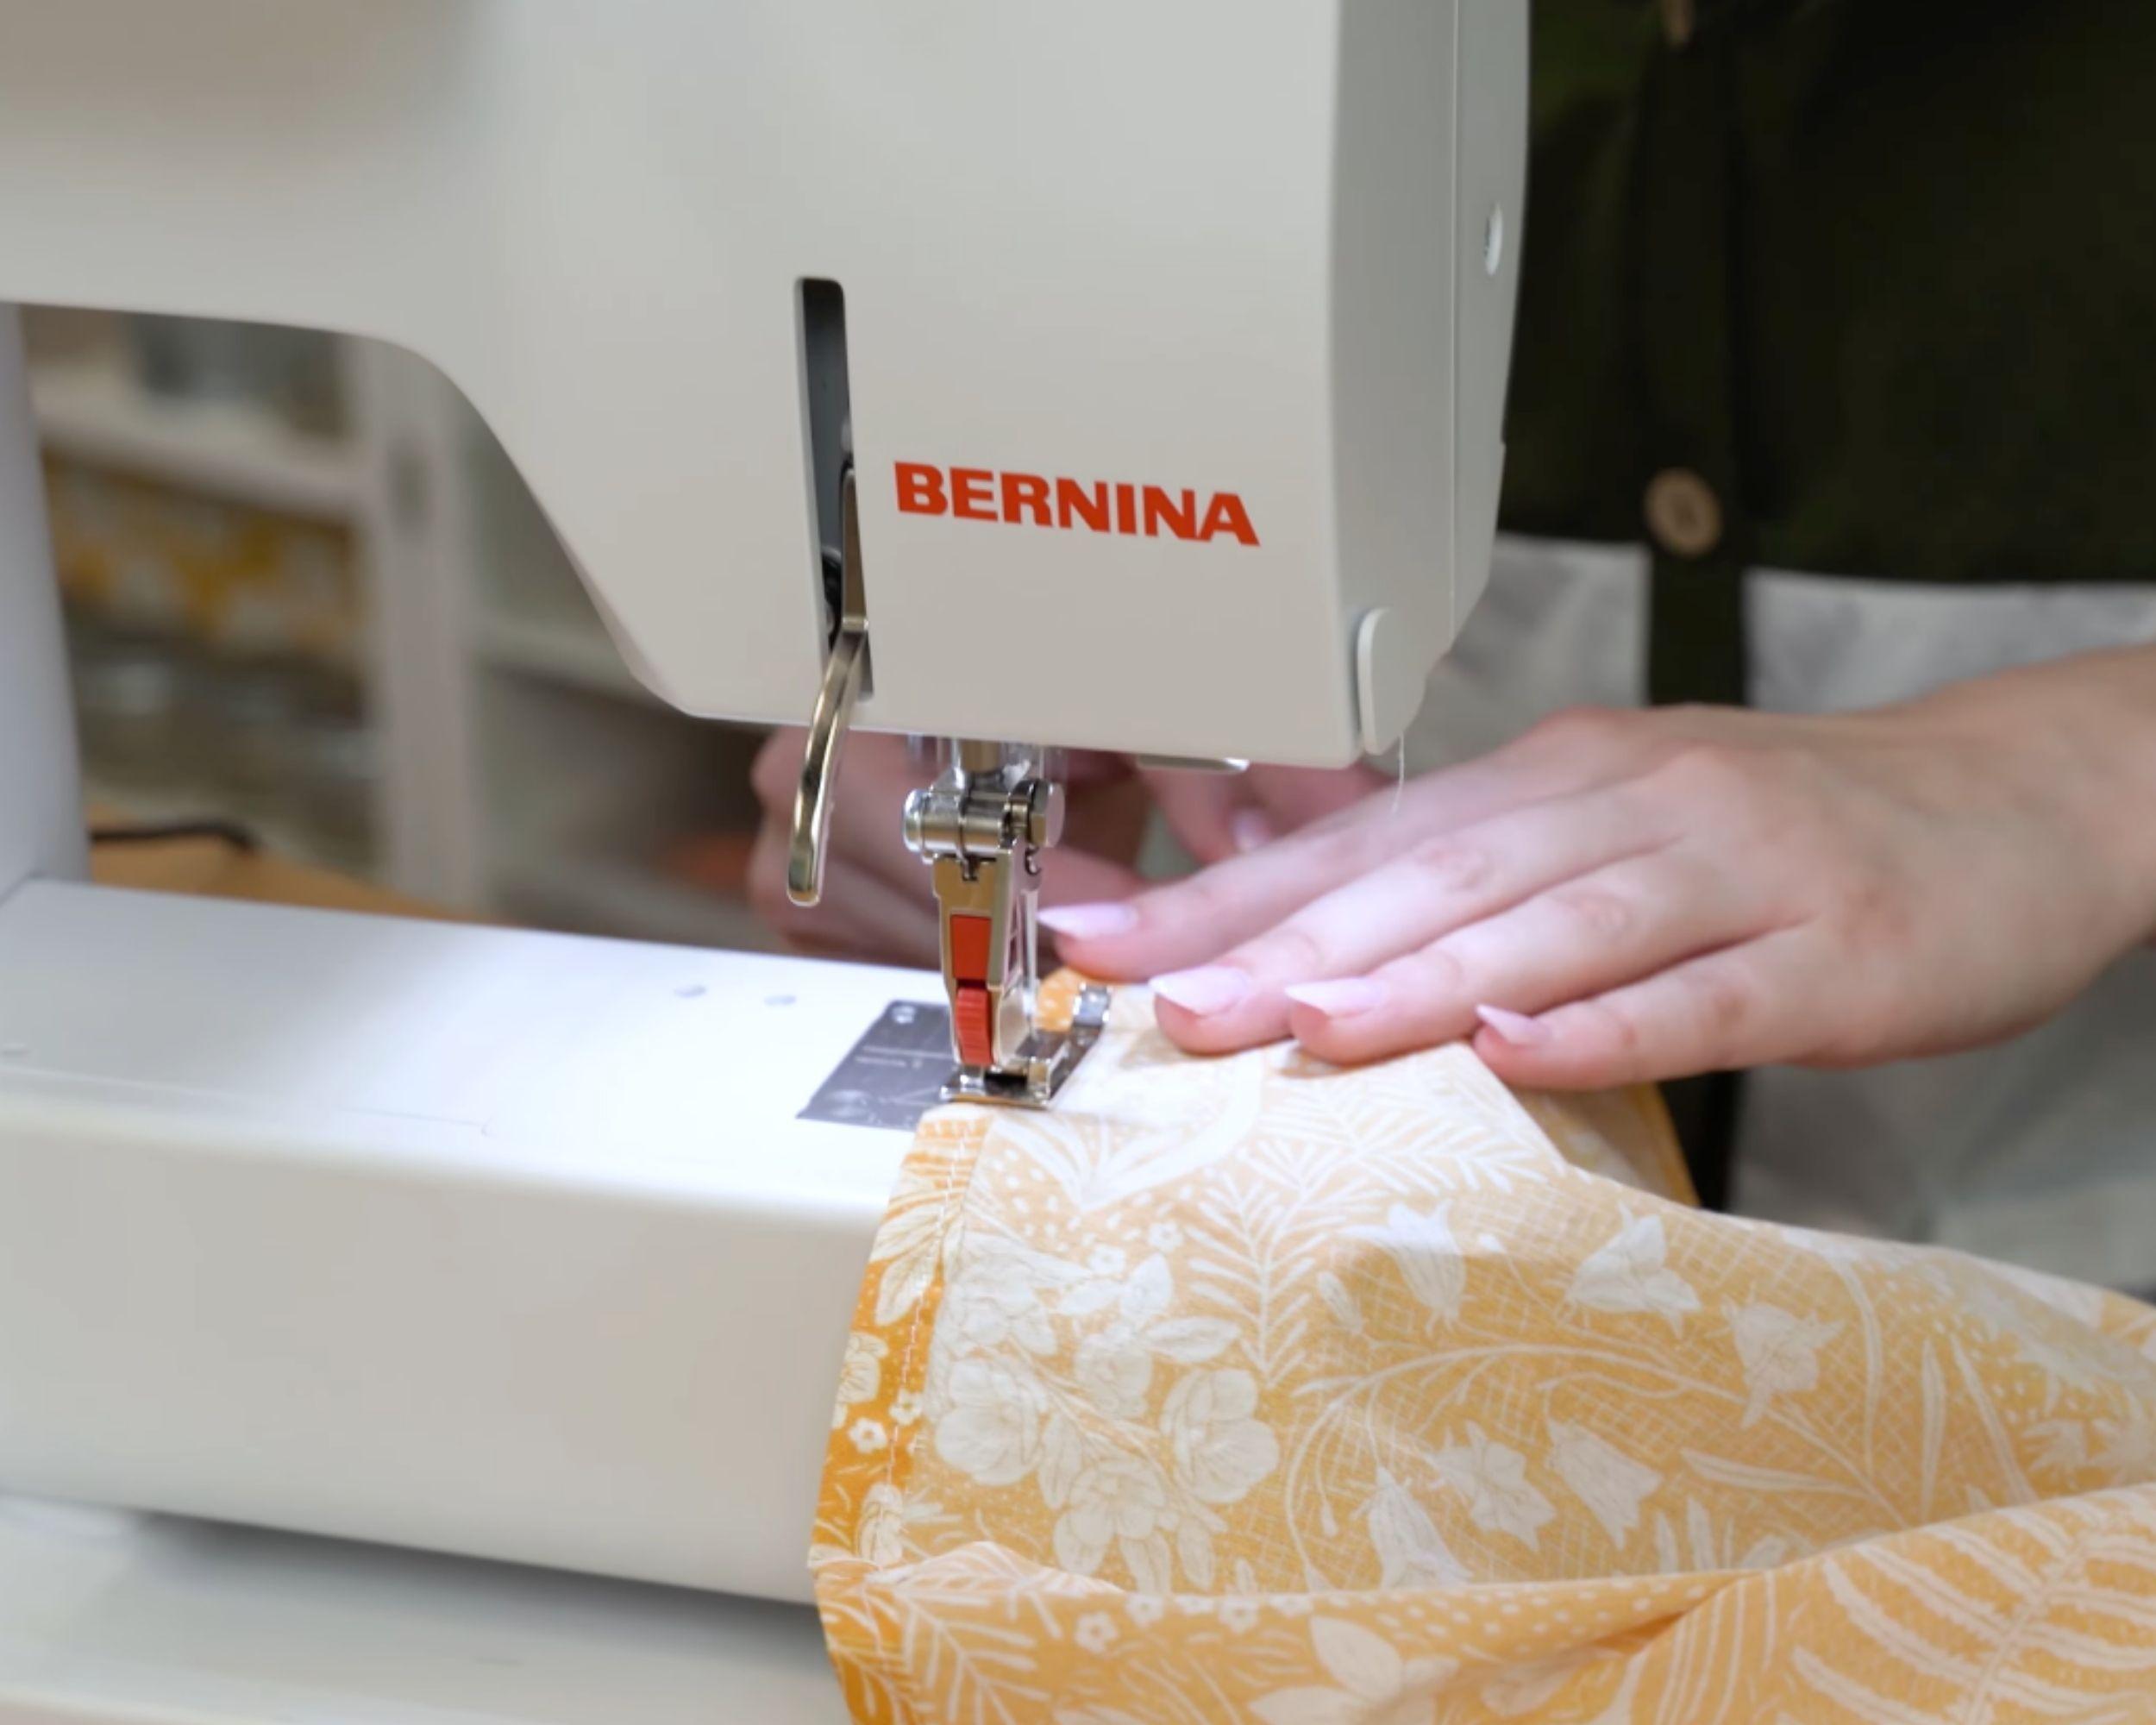 Sewing down the dress hem